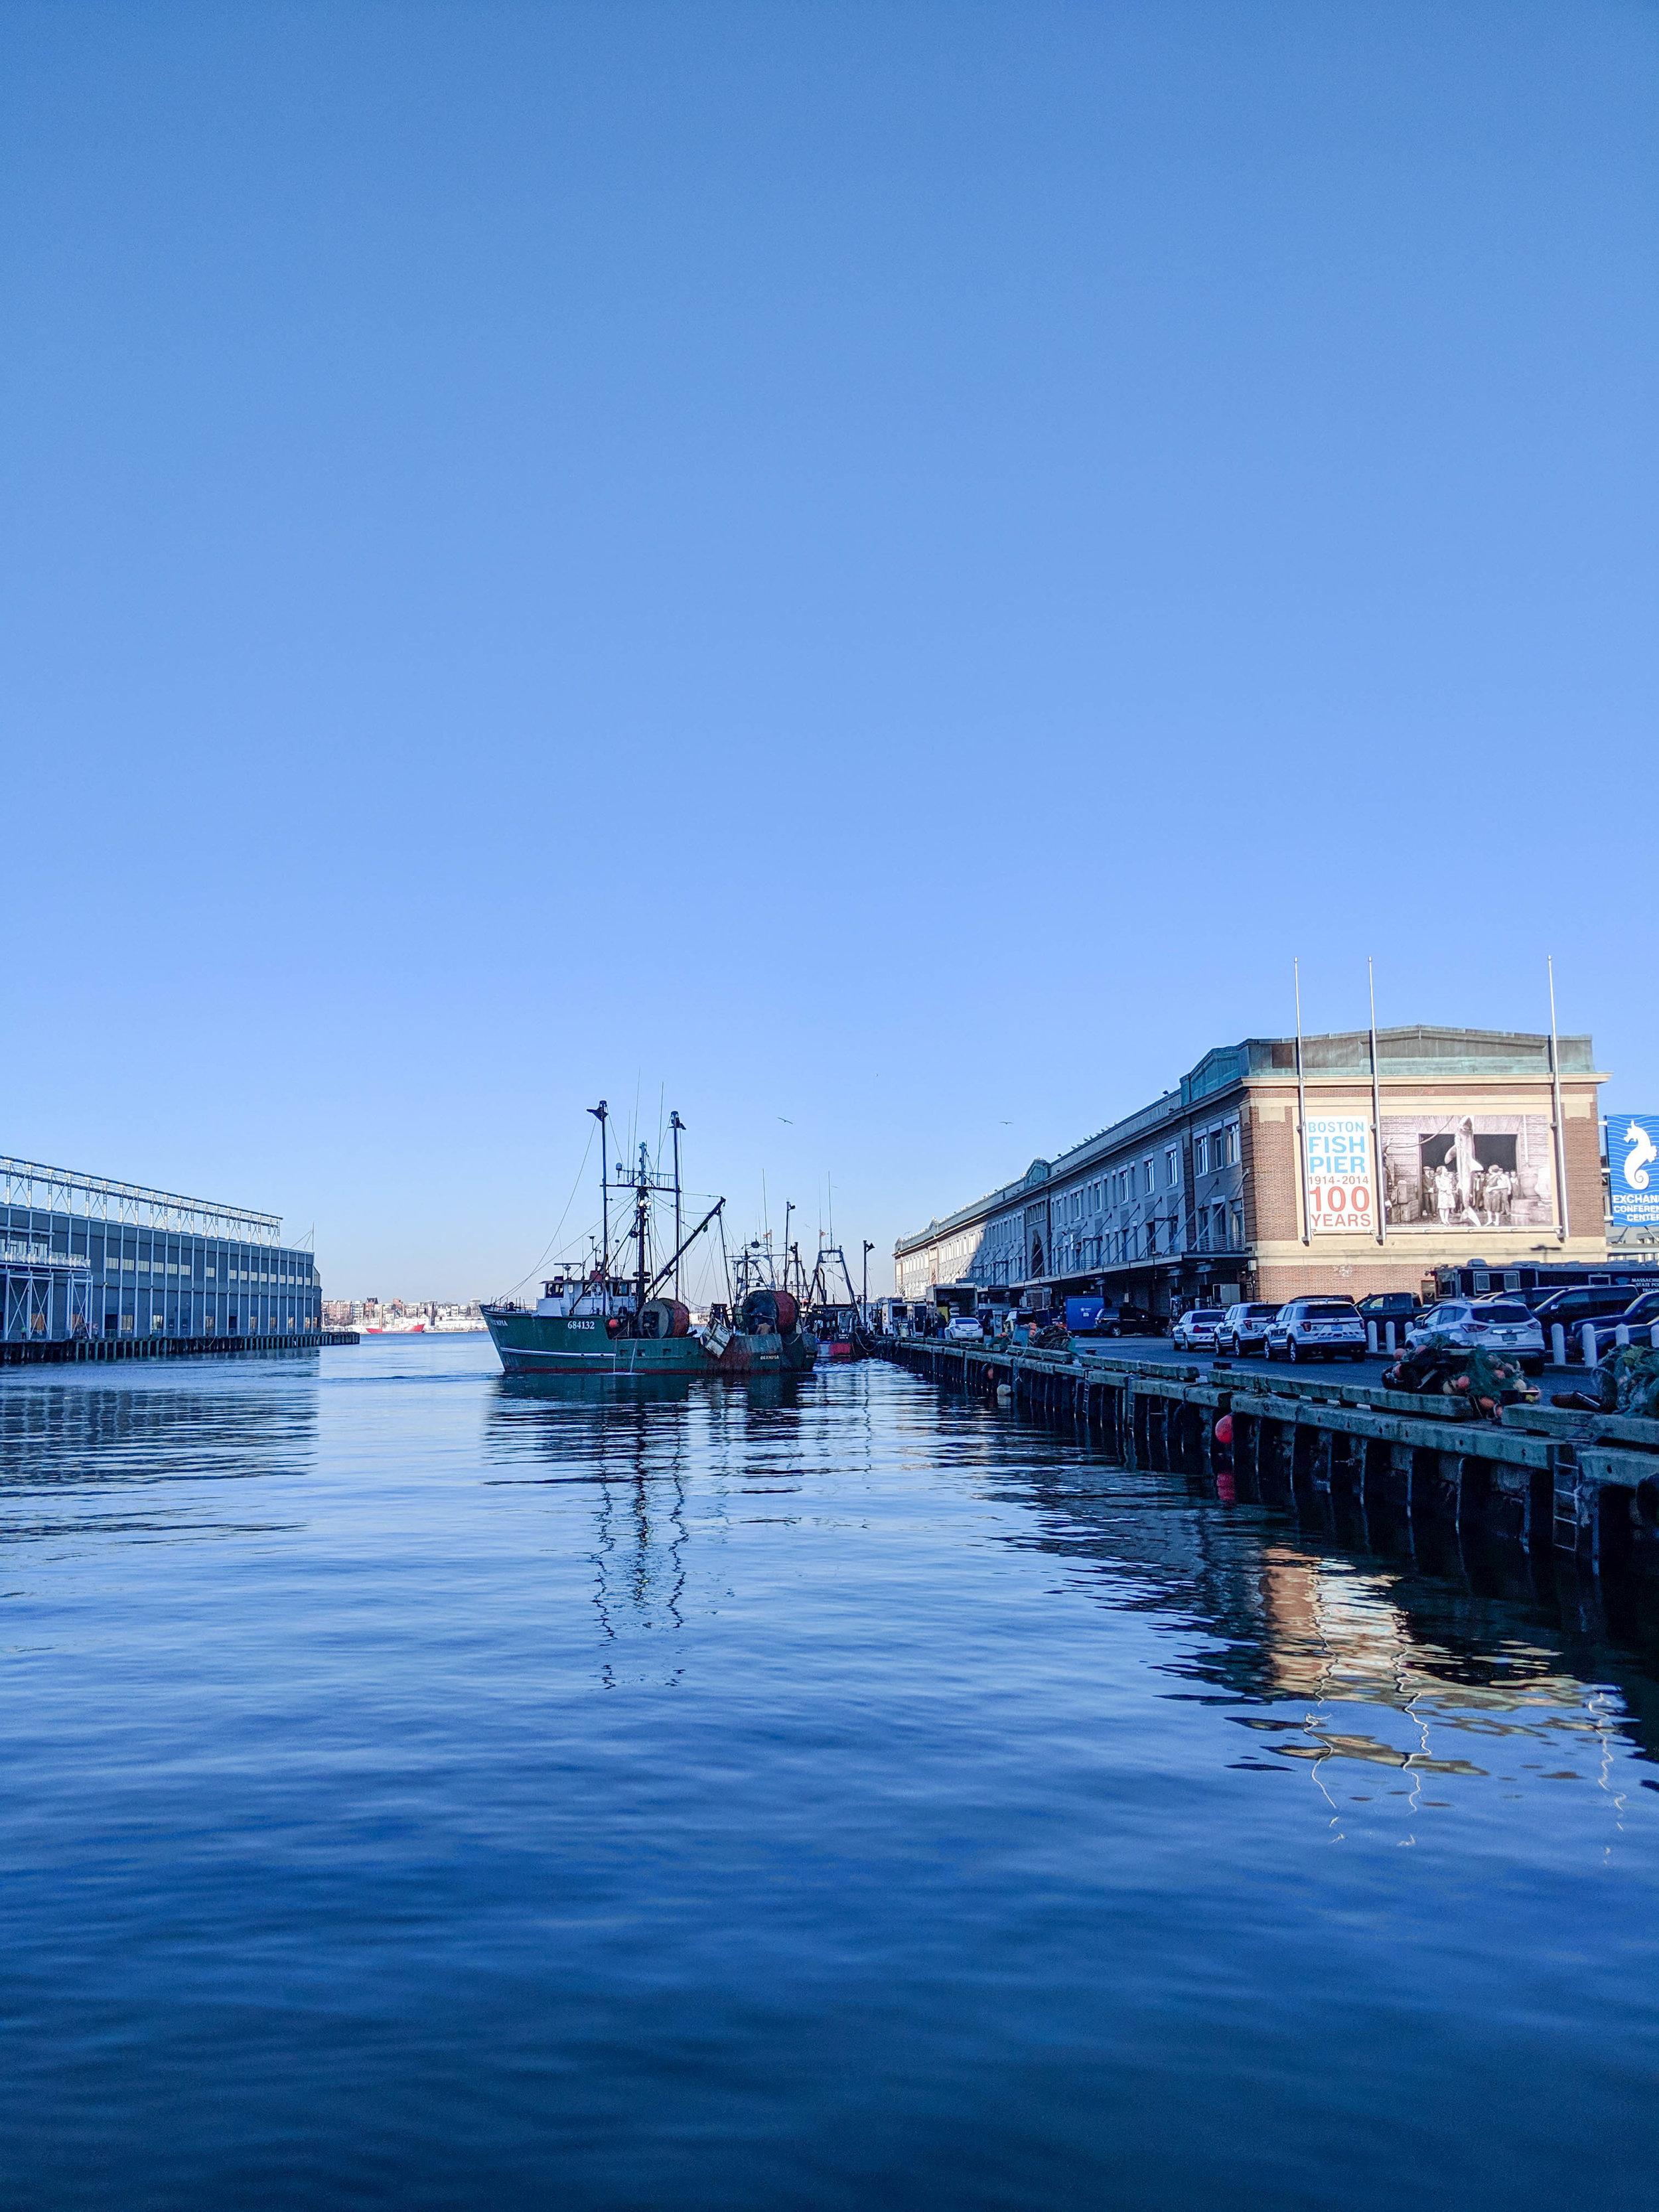 bri rinehart; photography; boston; seaport